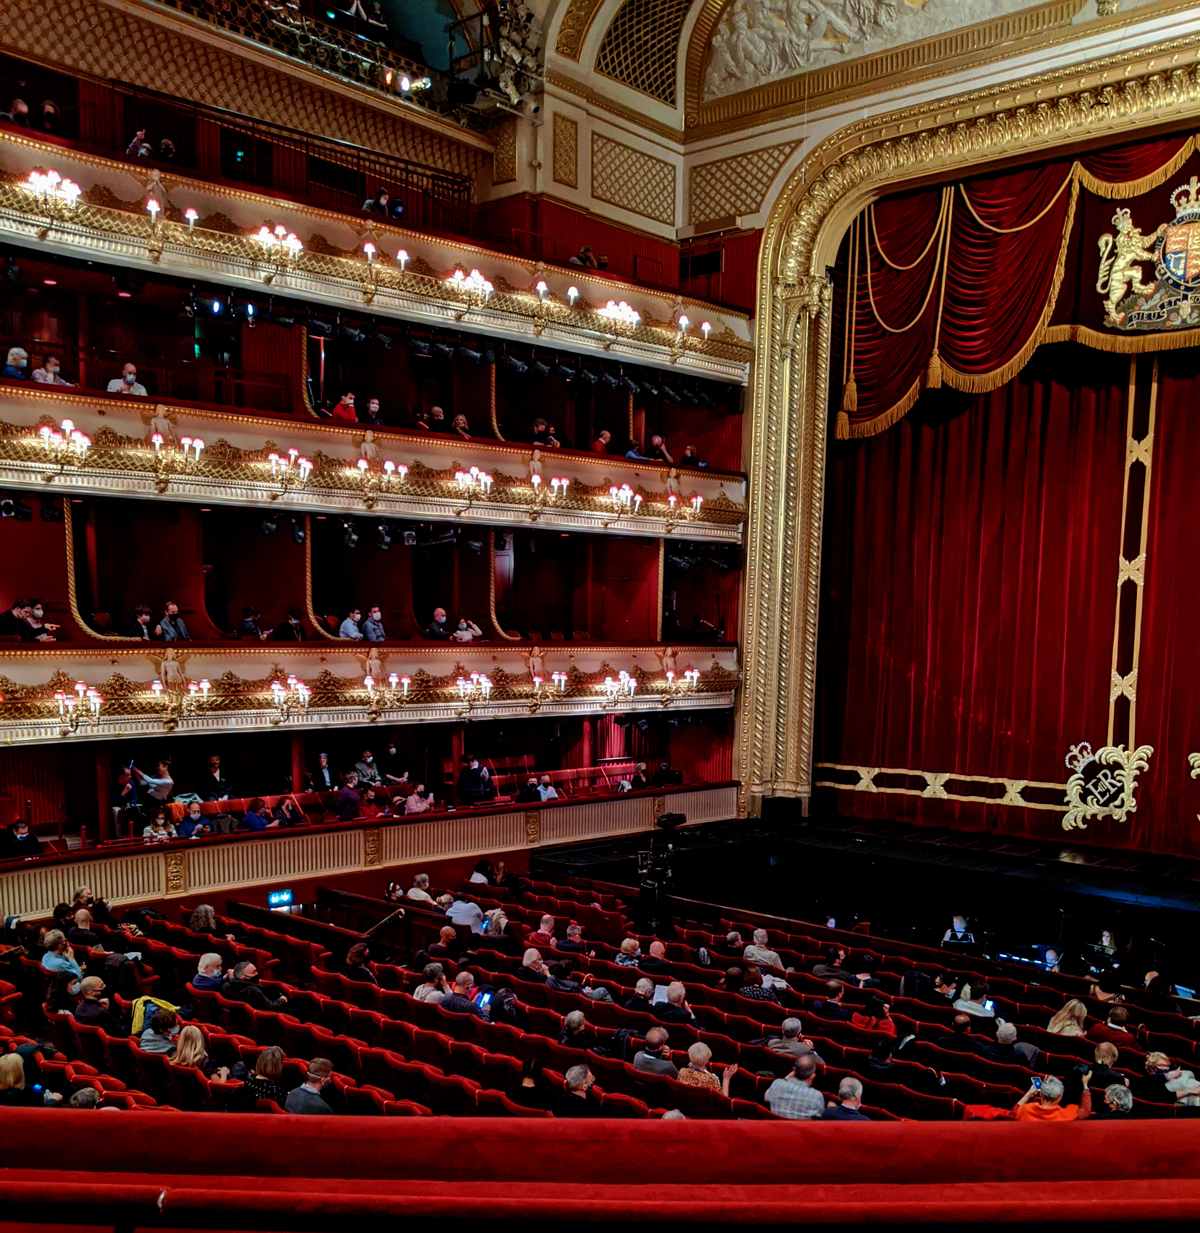 Socially Distanced Royal Opera House